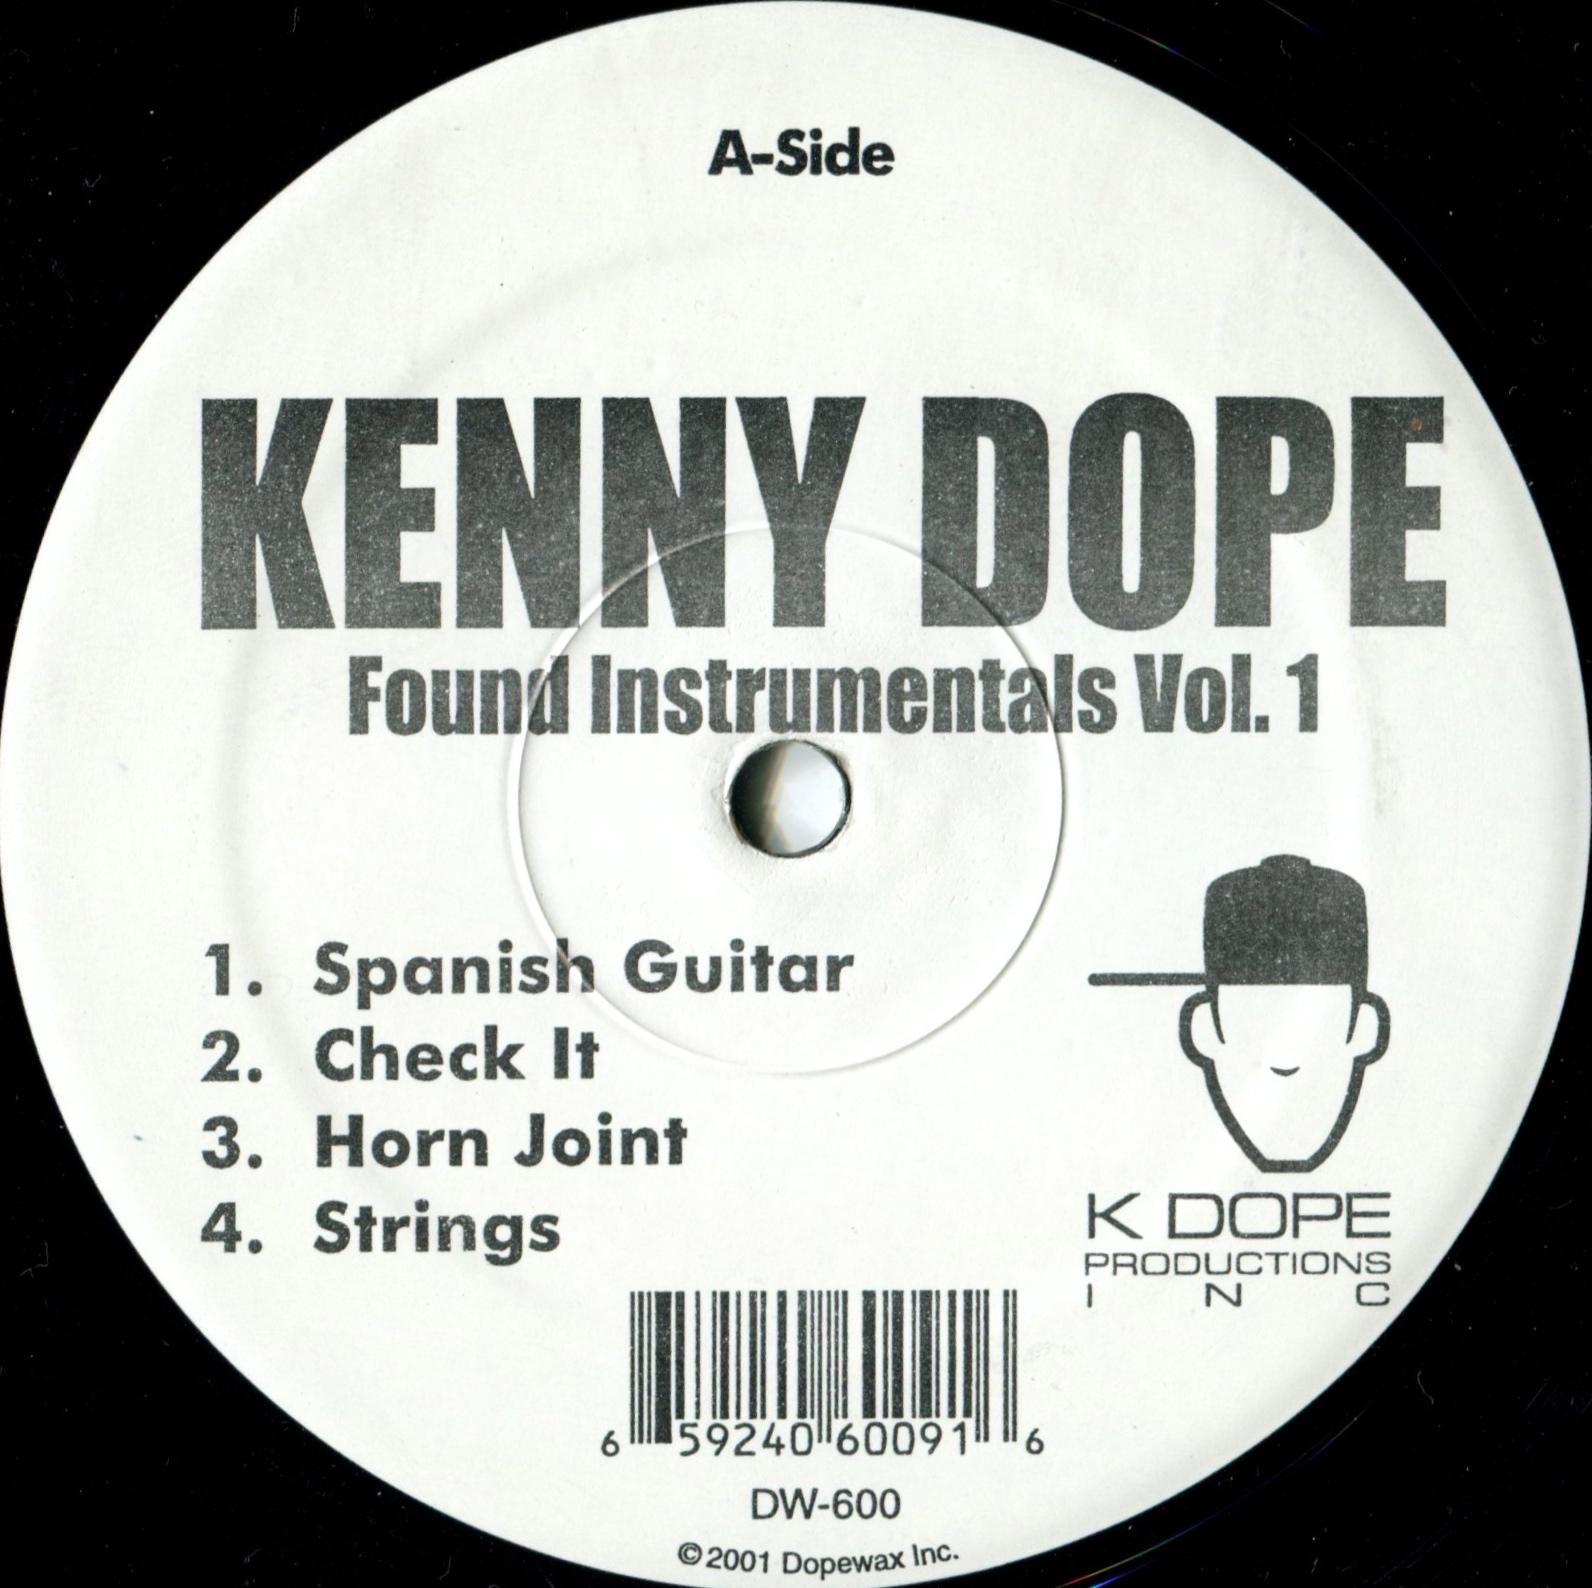 http://3.bp.blogspot.com/-nwJXF3gBlwc/UA3IRYP0SNI/AAAAAAAAEnU/FF0DKM70o_8/s1600/Kenny+Dope+Found+Instrumentals+A.jpg